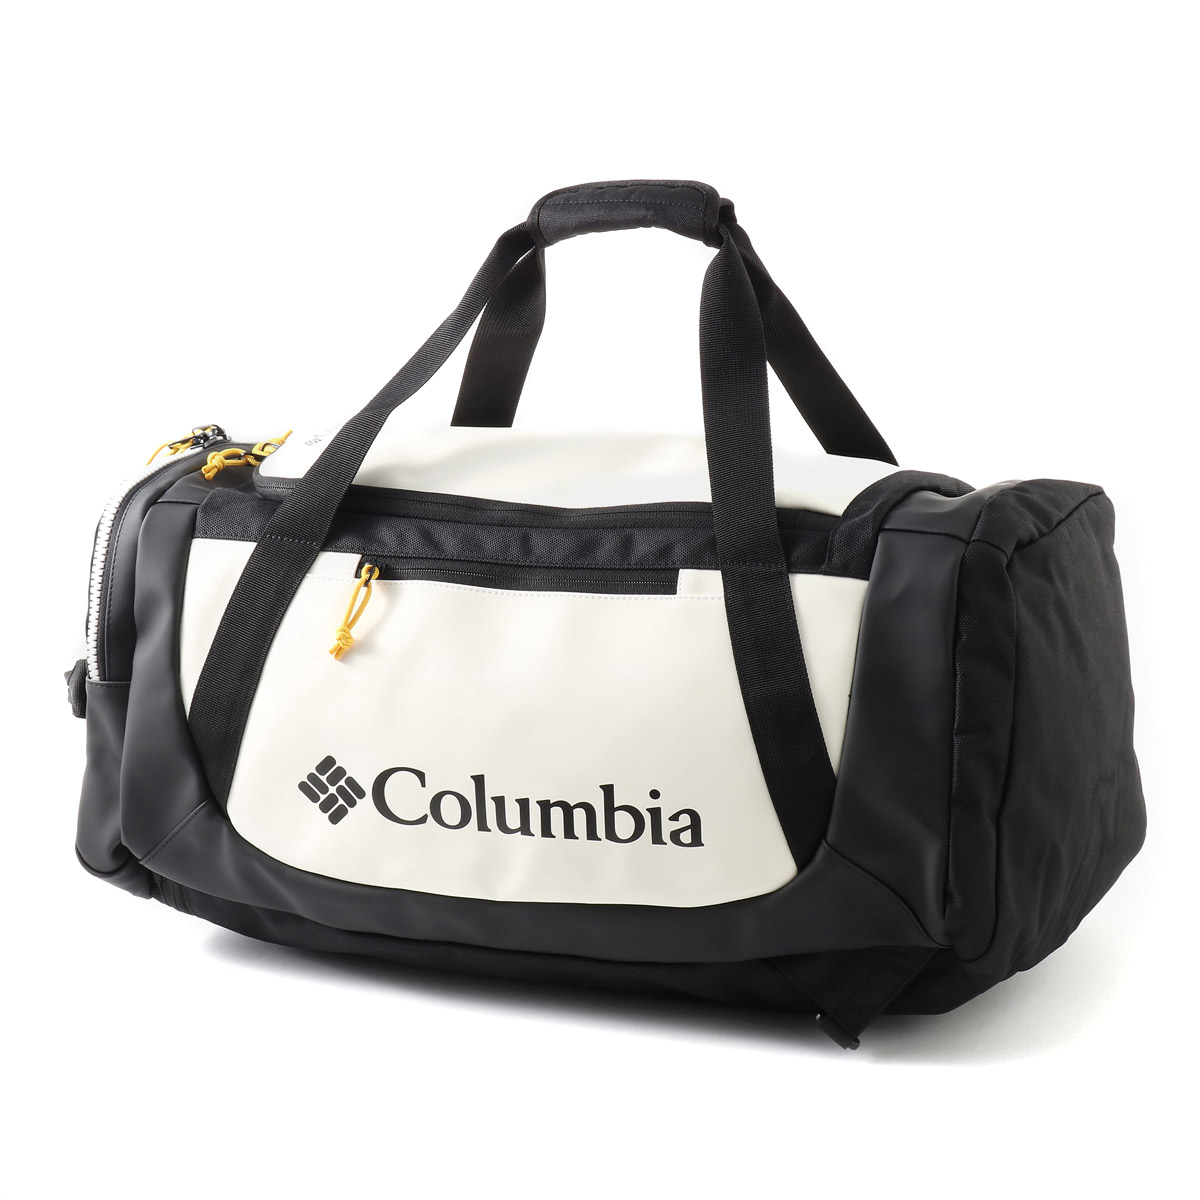 Columbia BREMNER SLOPE 40L DUFFLE(コロンビア ブレムナースロープ40Lダッフル)Sea Salt【 ダッフルバッグ】18SP I|atmos ピンク